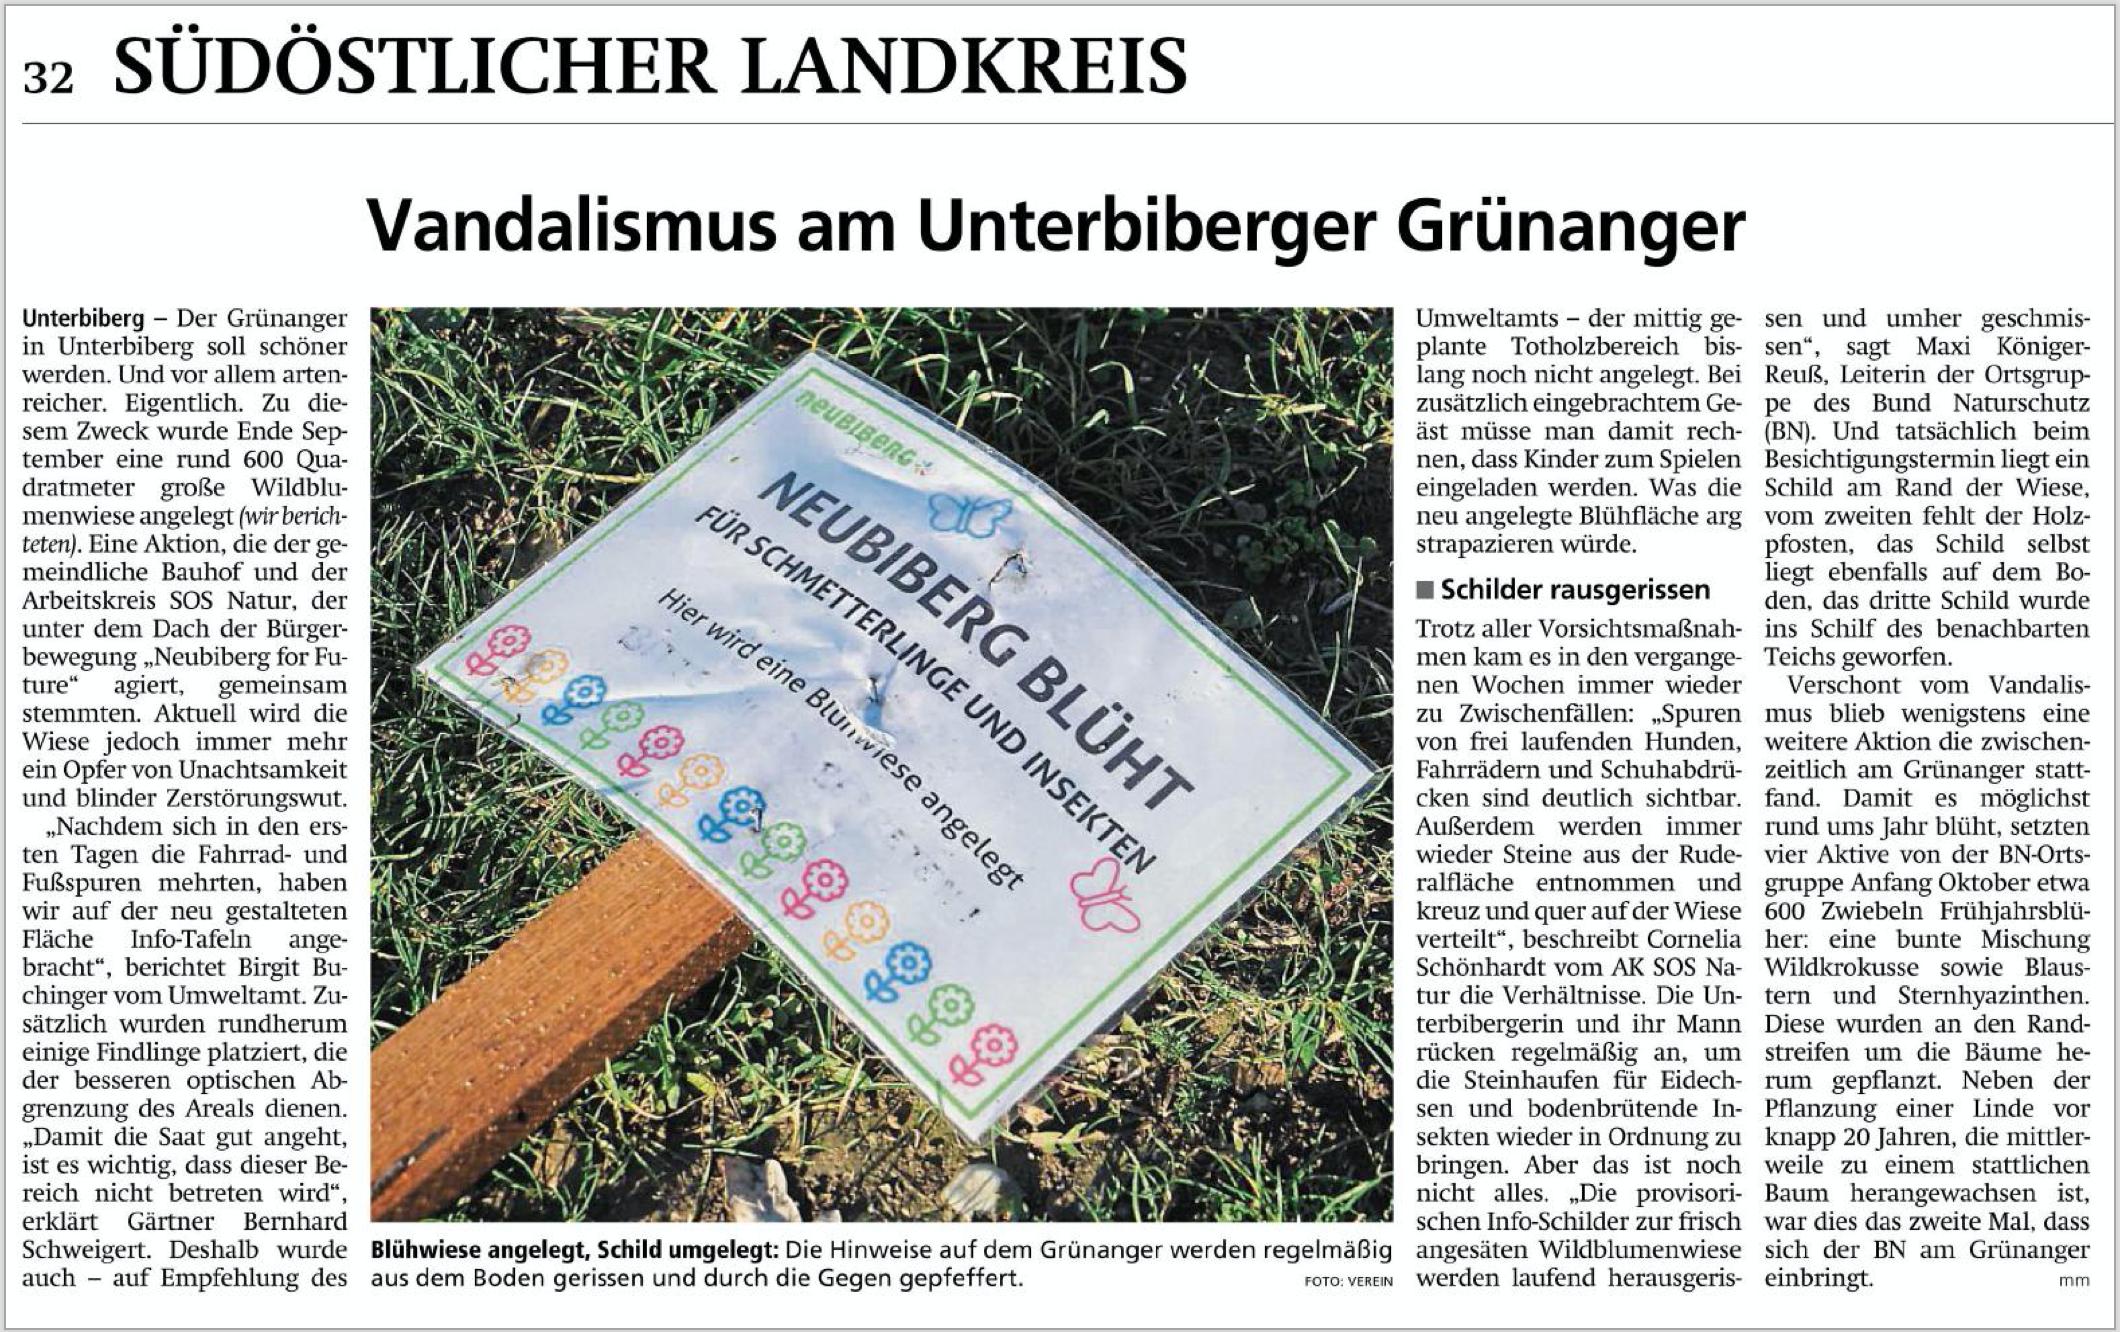 Vandalismus am Unterbiberger Grünanger